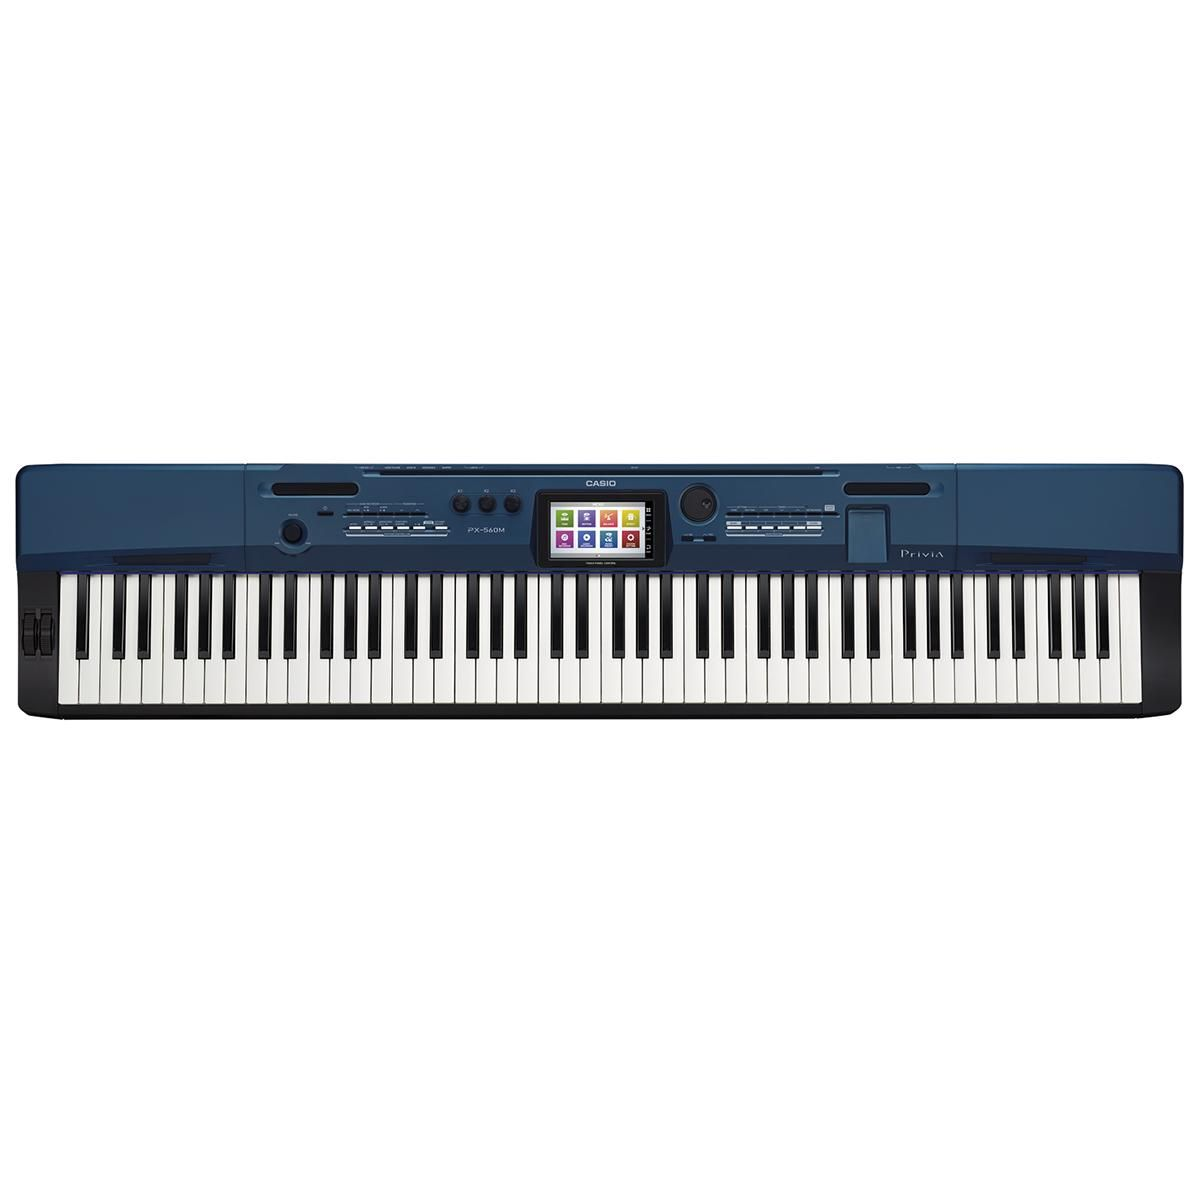 Piano Digital Casio Px560 Privia   - MegaLojaSP